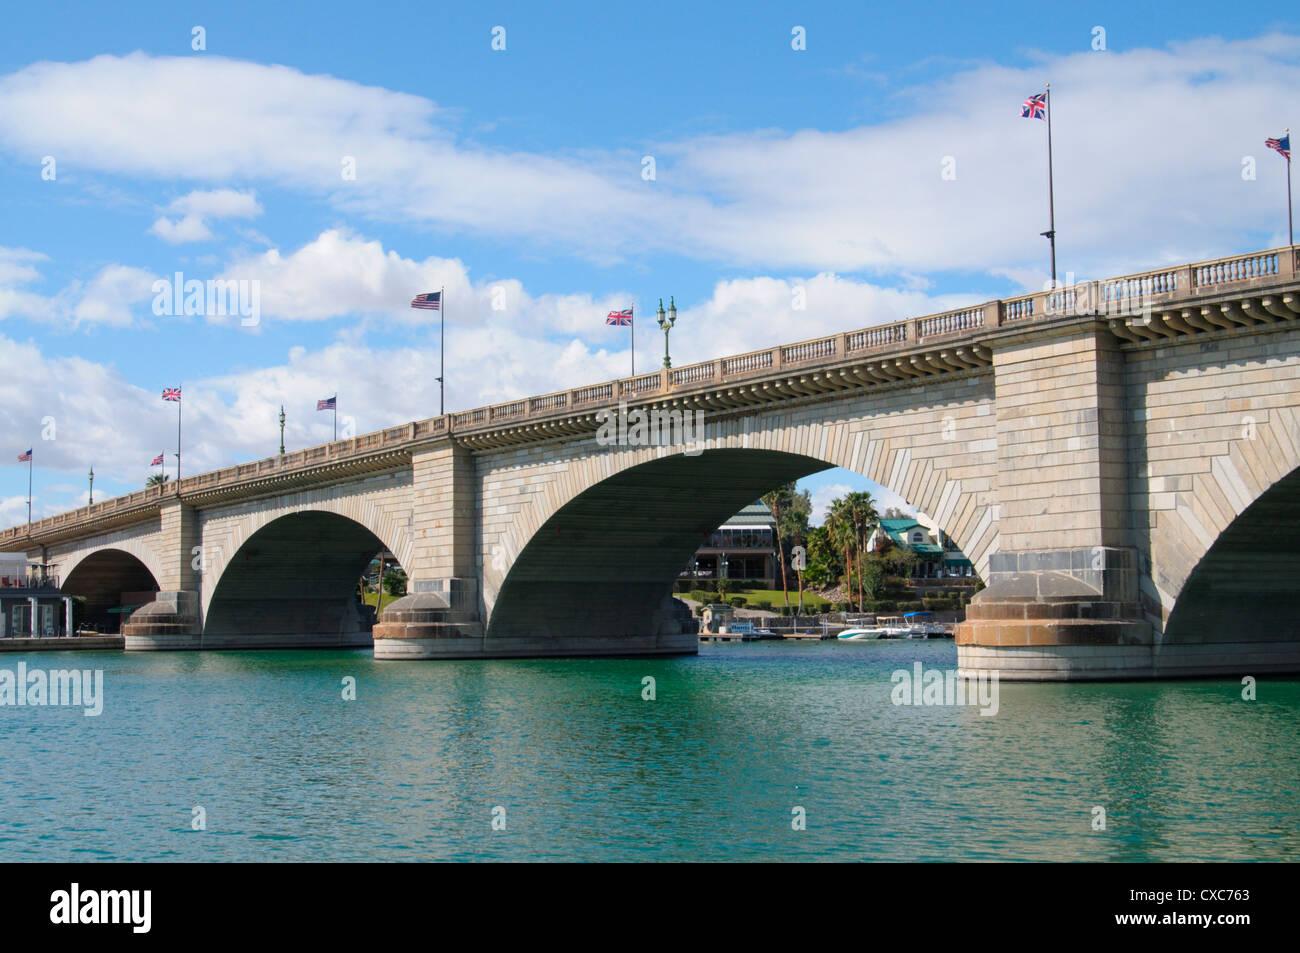 London Bridge, Lake Havasu City, Arizona, United States of America, North America - Stock Image